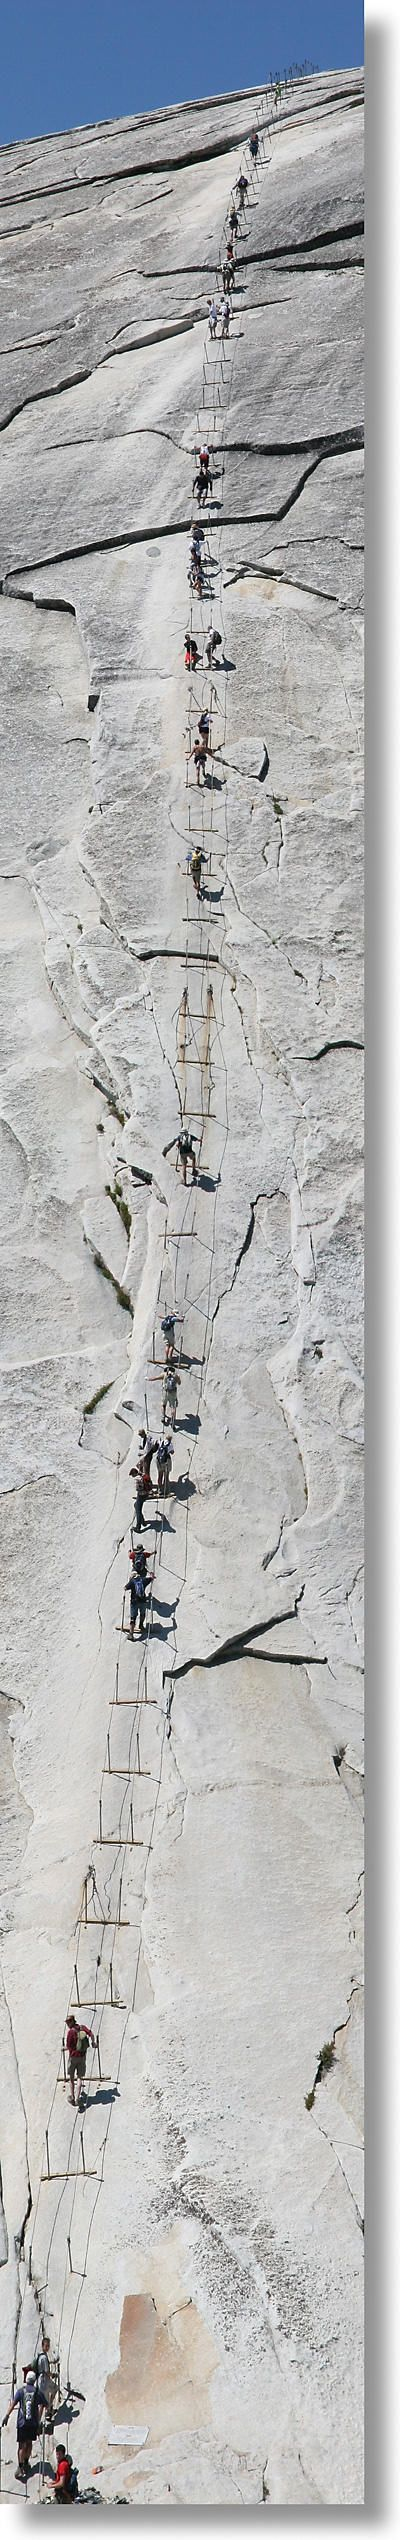 Half Dome Yosemite Park -- MUST do this climb!